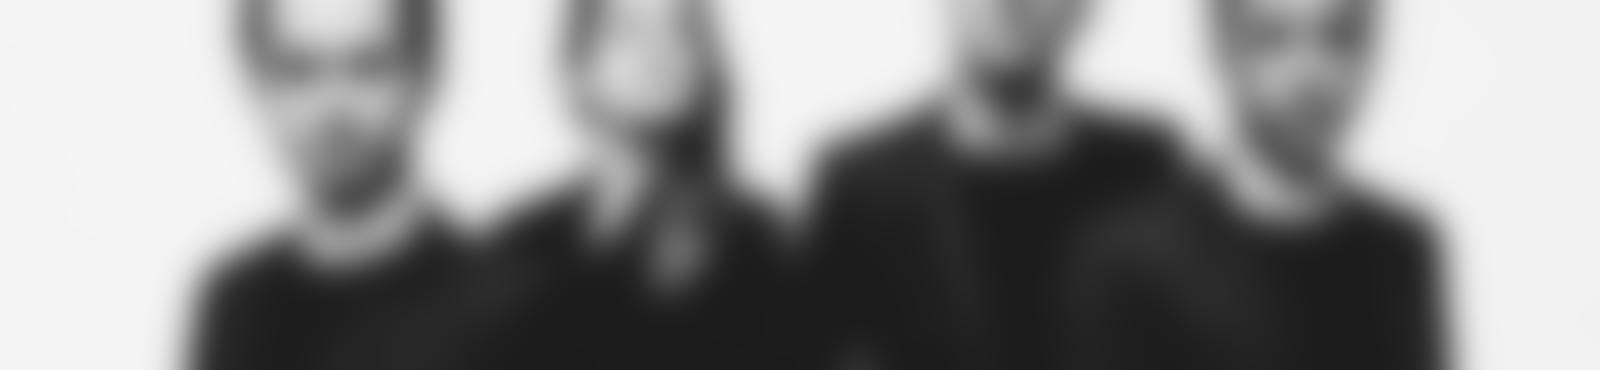 Blurred be388f5d deee 445a bd9c e5568947f3a2